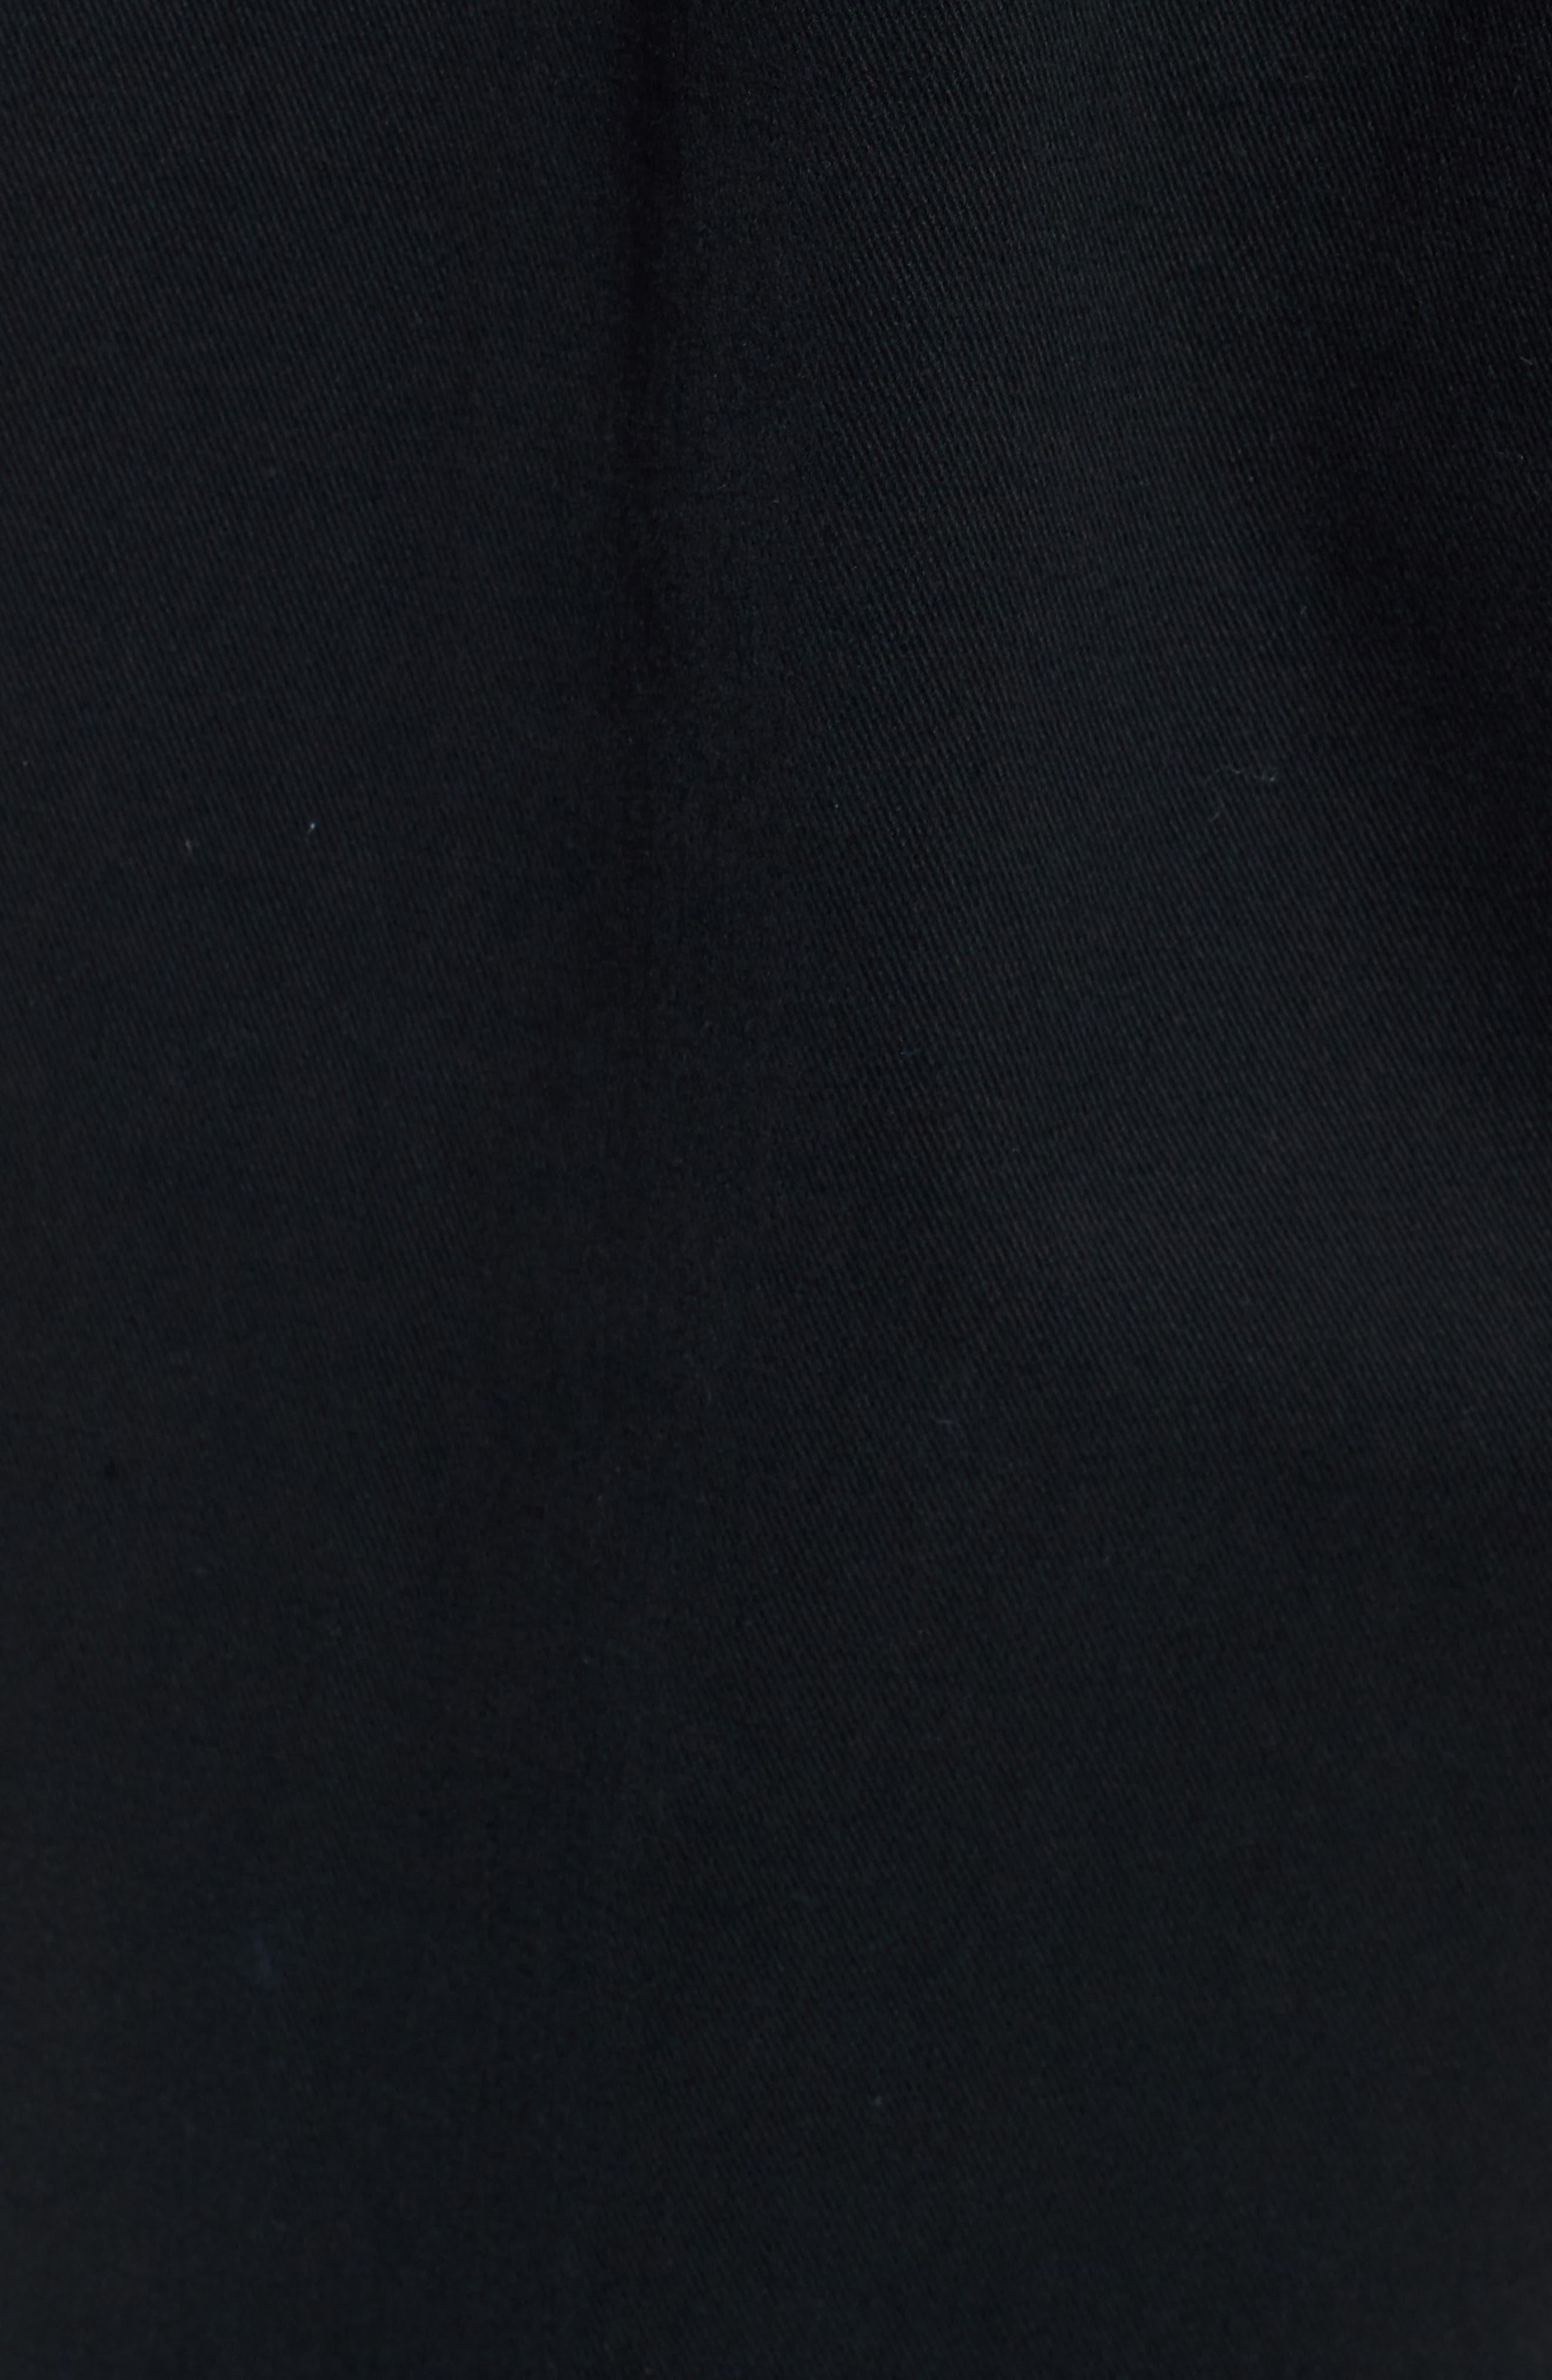 Fubar Pleated Relaxed Fit Pants,                             Alternate thumbnail 5, color,                             BLACK